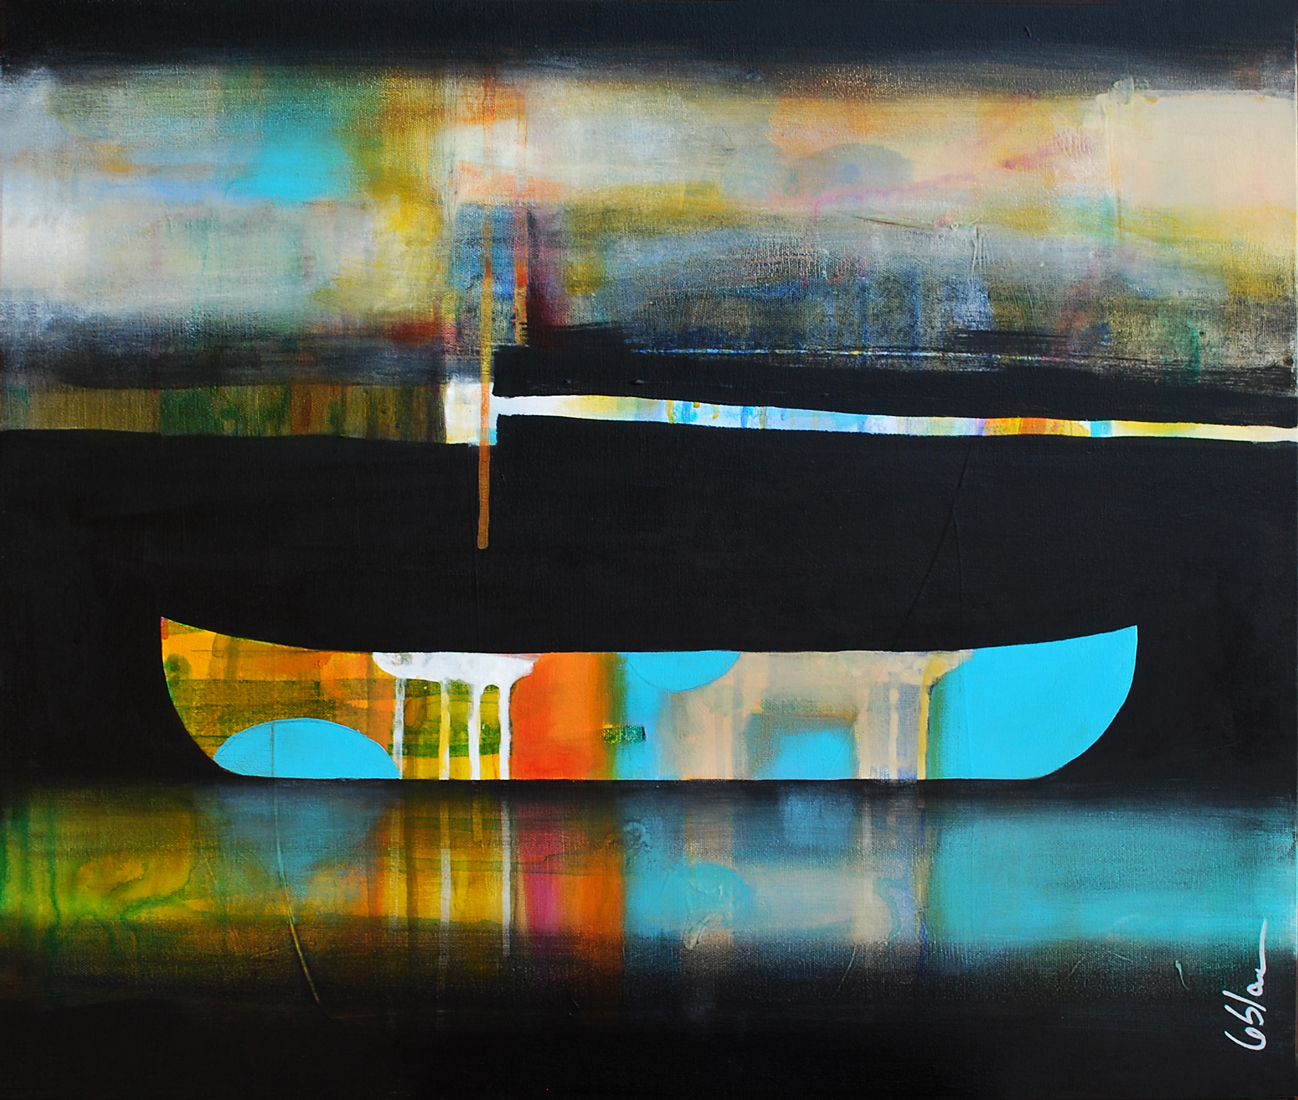 C'est certain il y a quelque chose, mixed media canoe painting by Sylvain Leblanc   Effusion Art Gallery + Cast Glass Studio, Invermere BC